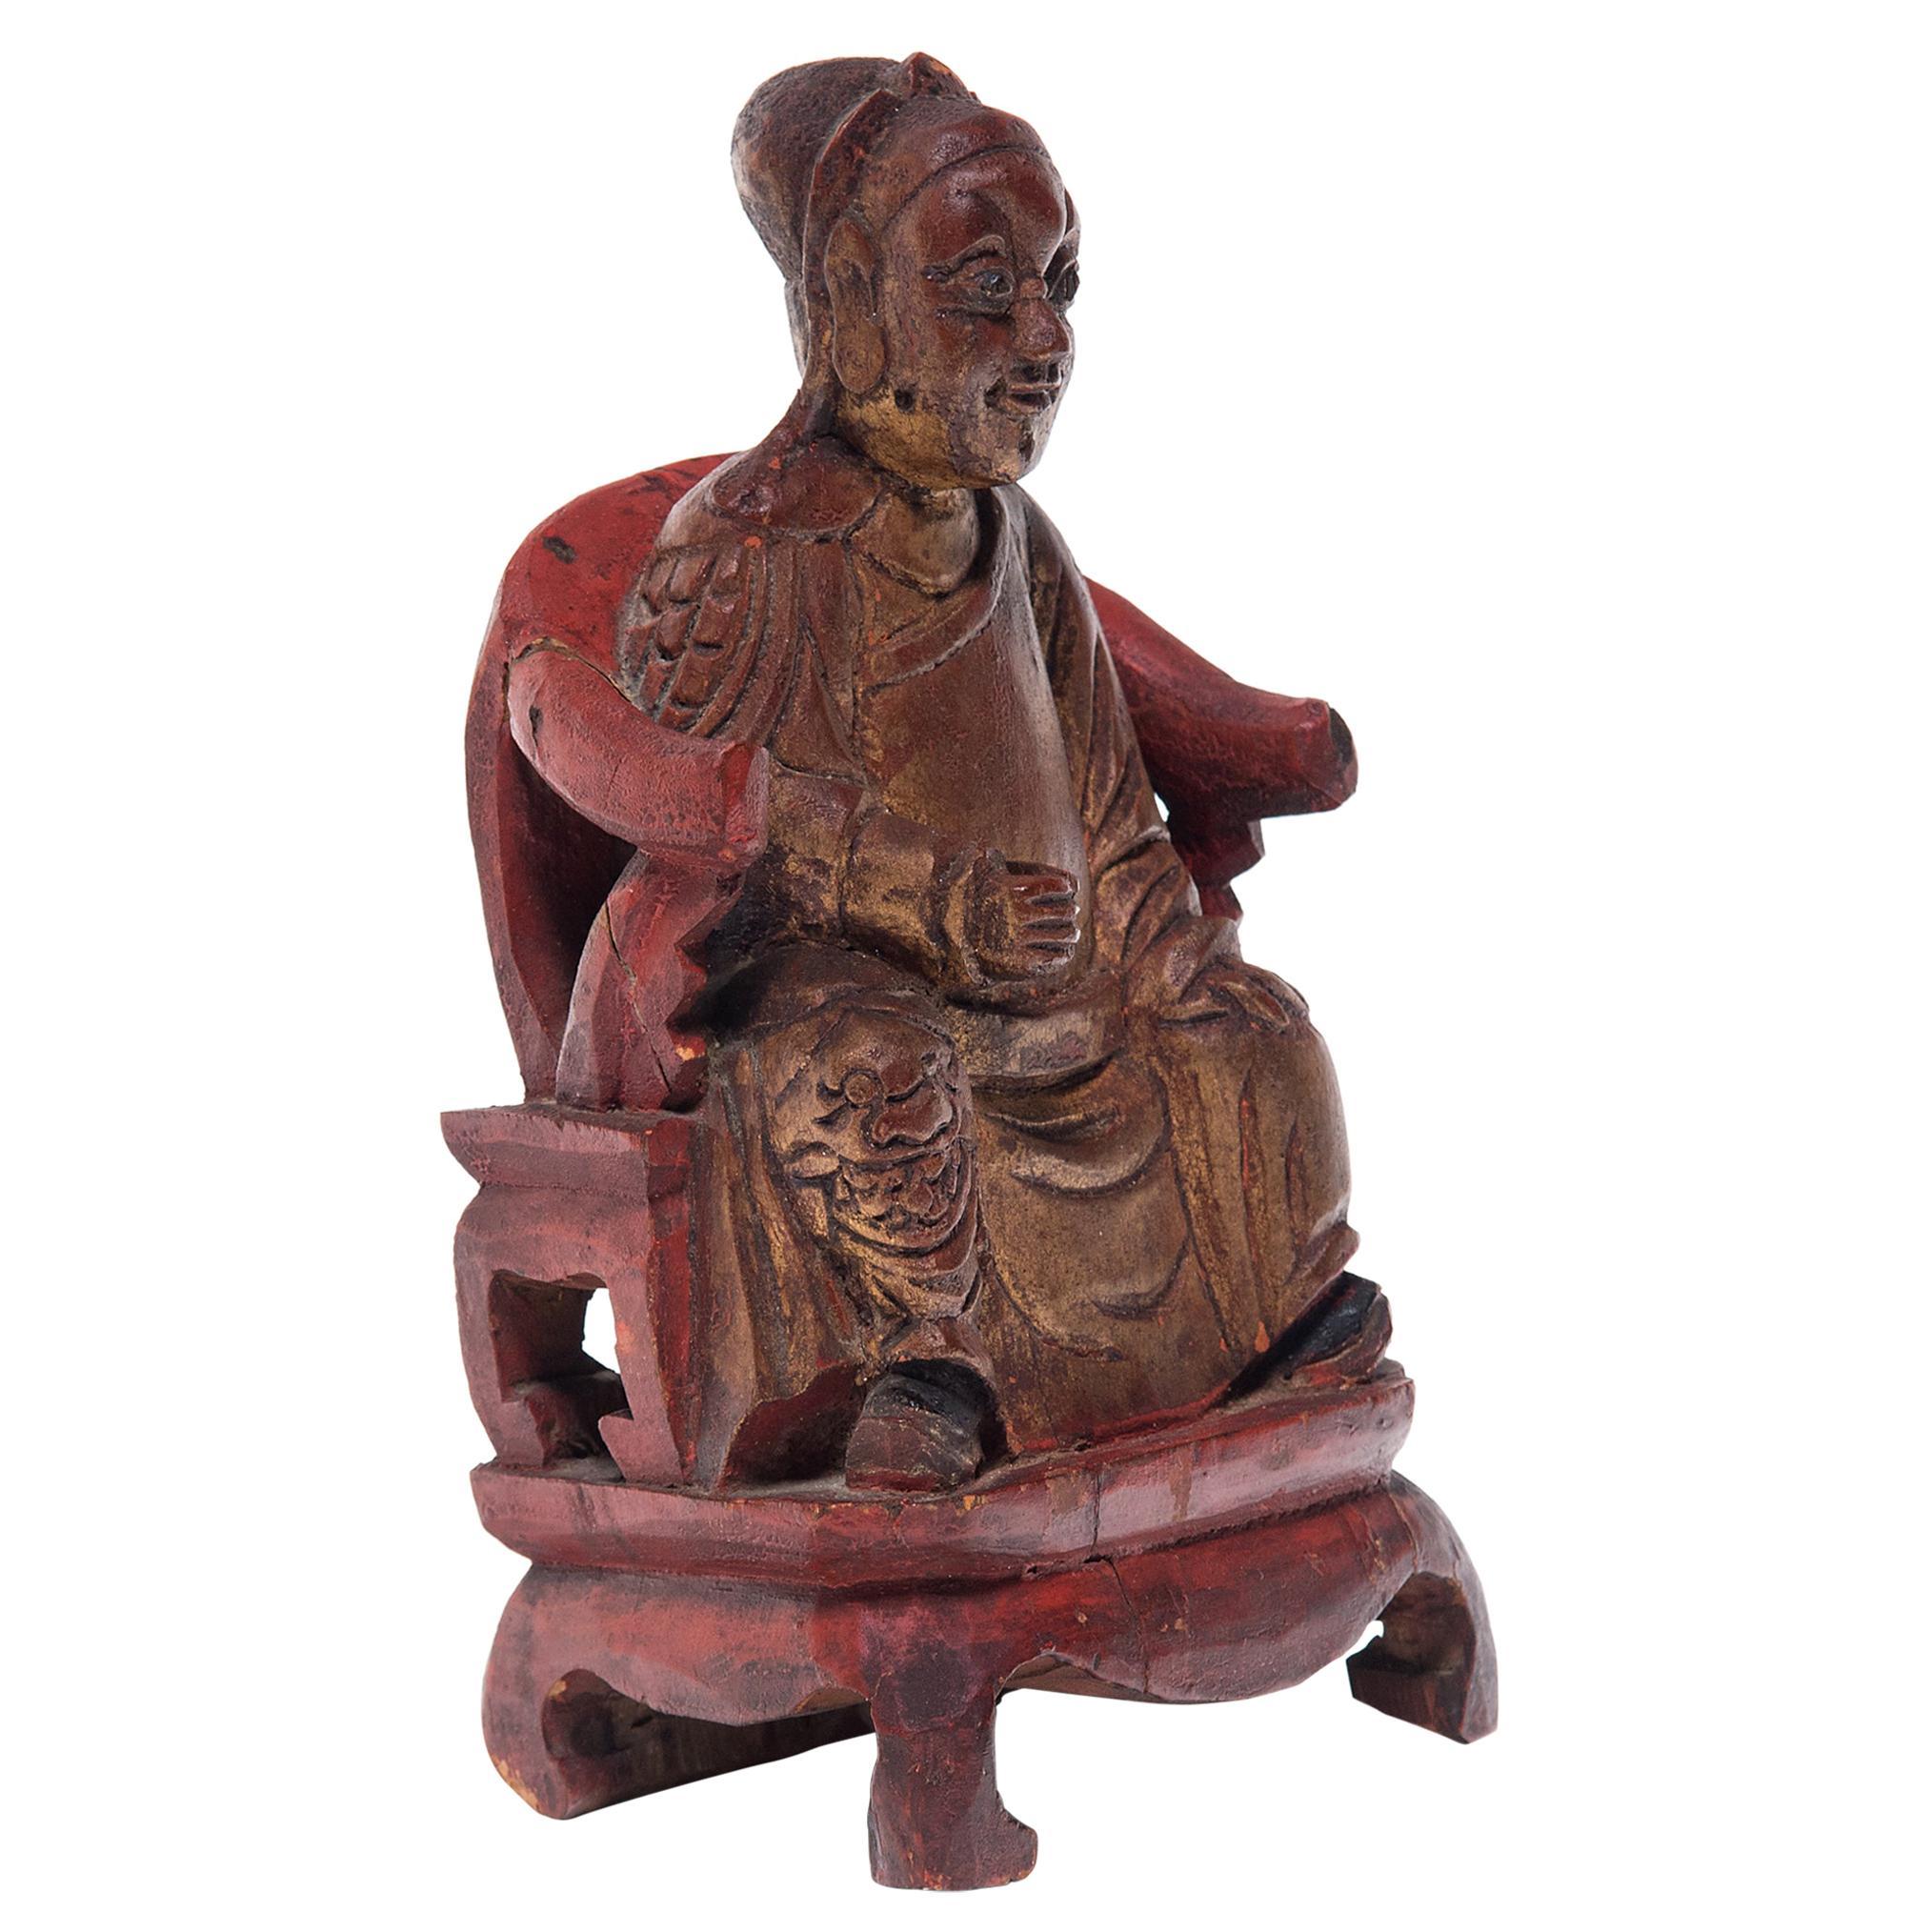 Chinese Gilt Ancestor Figure, c. 1900